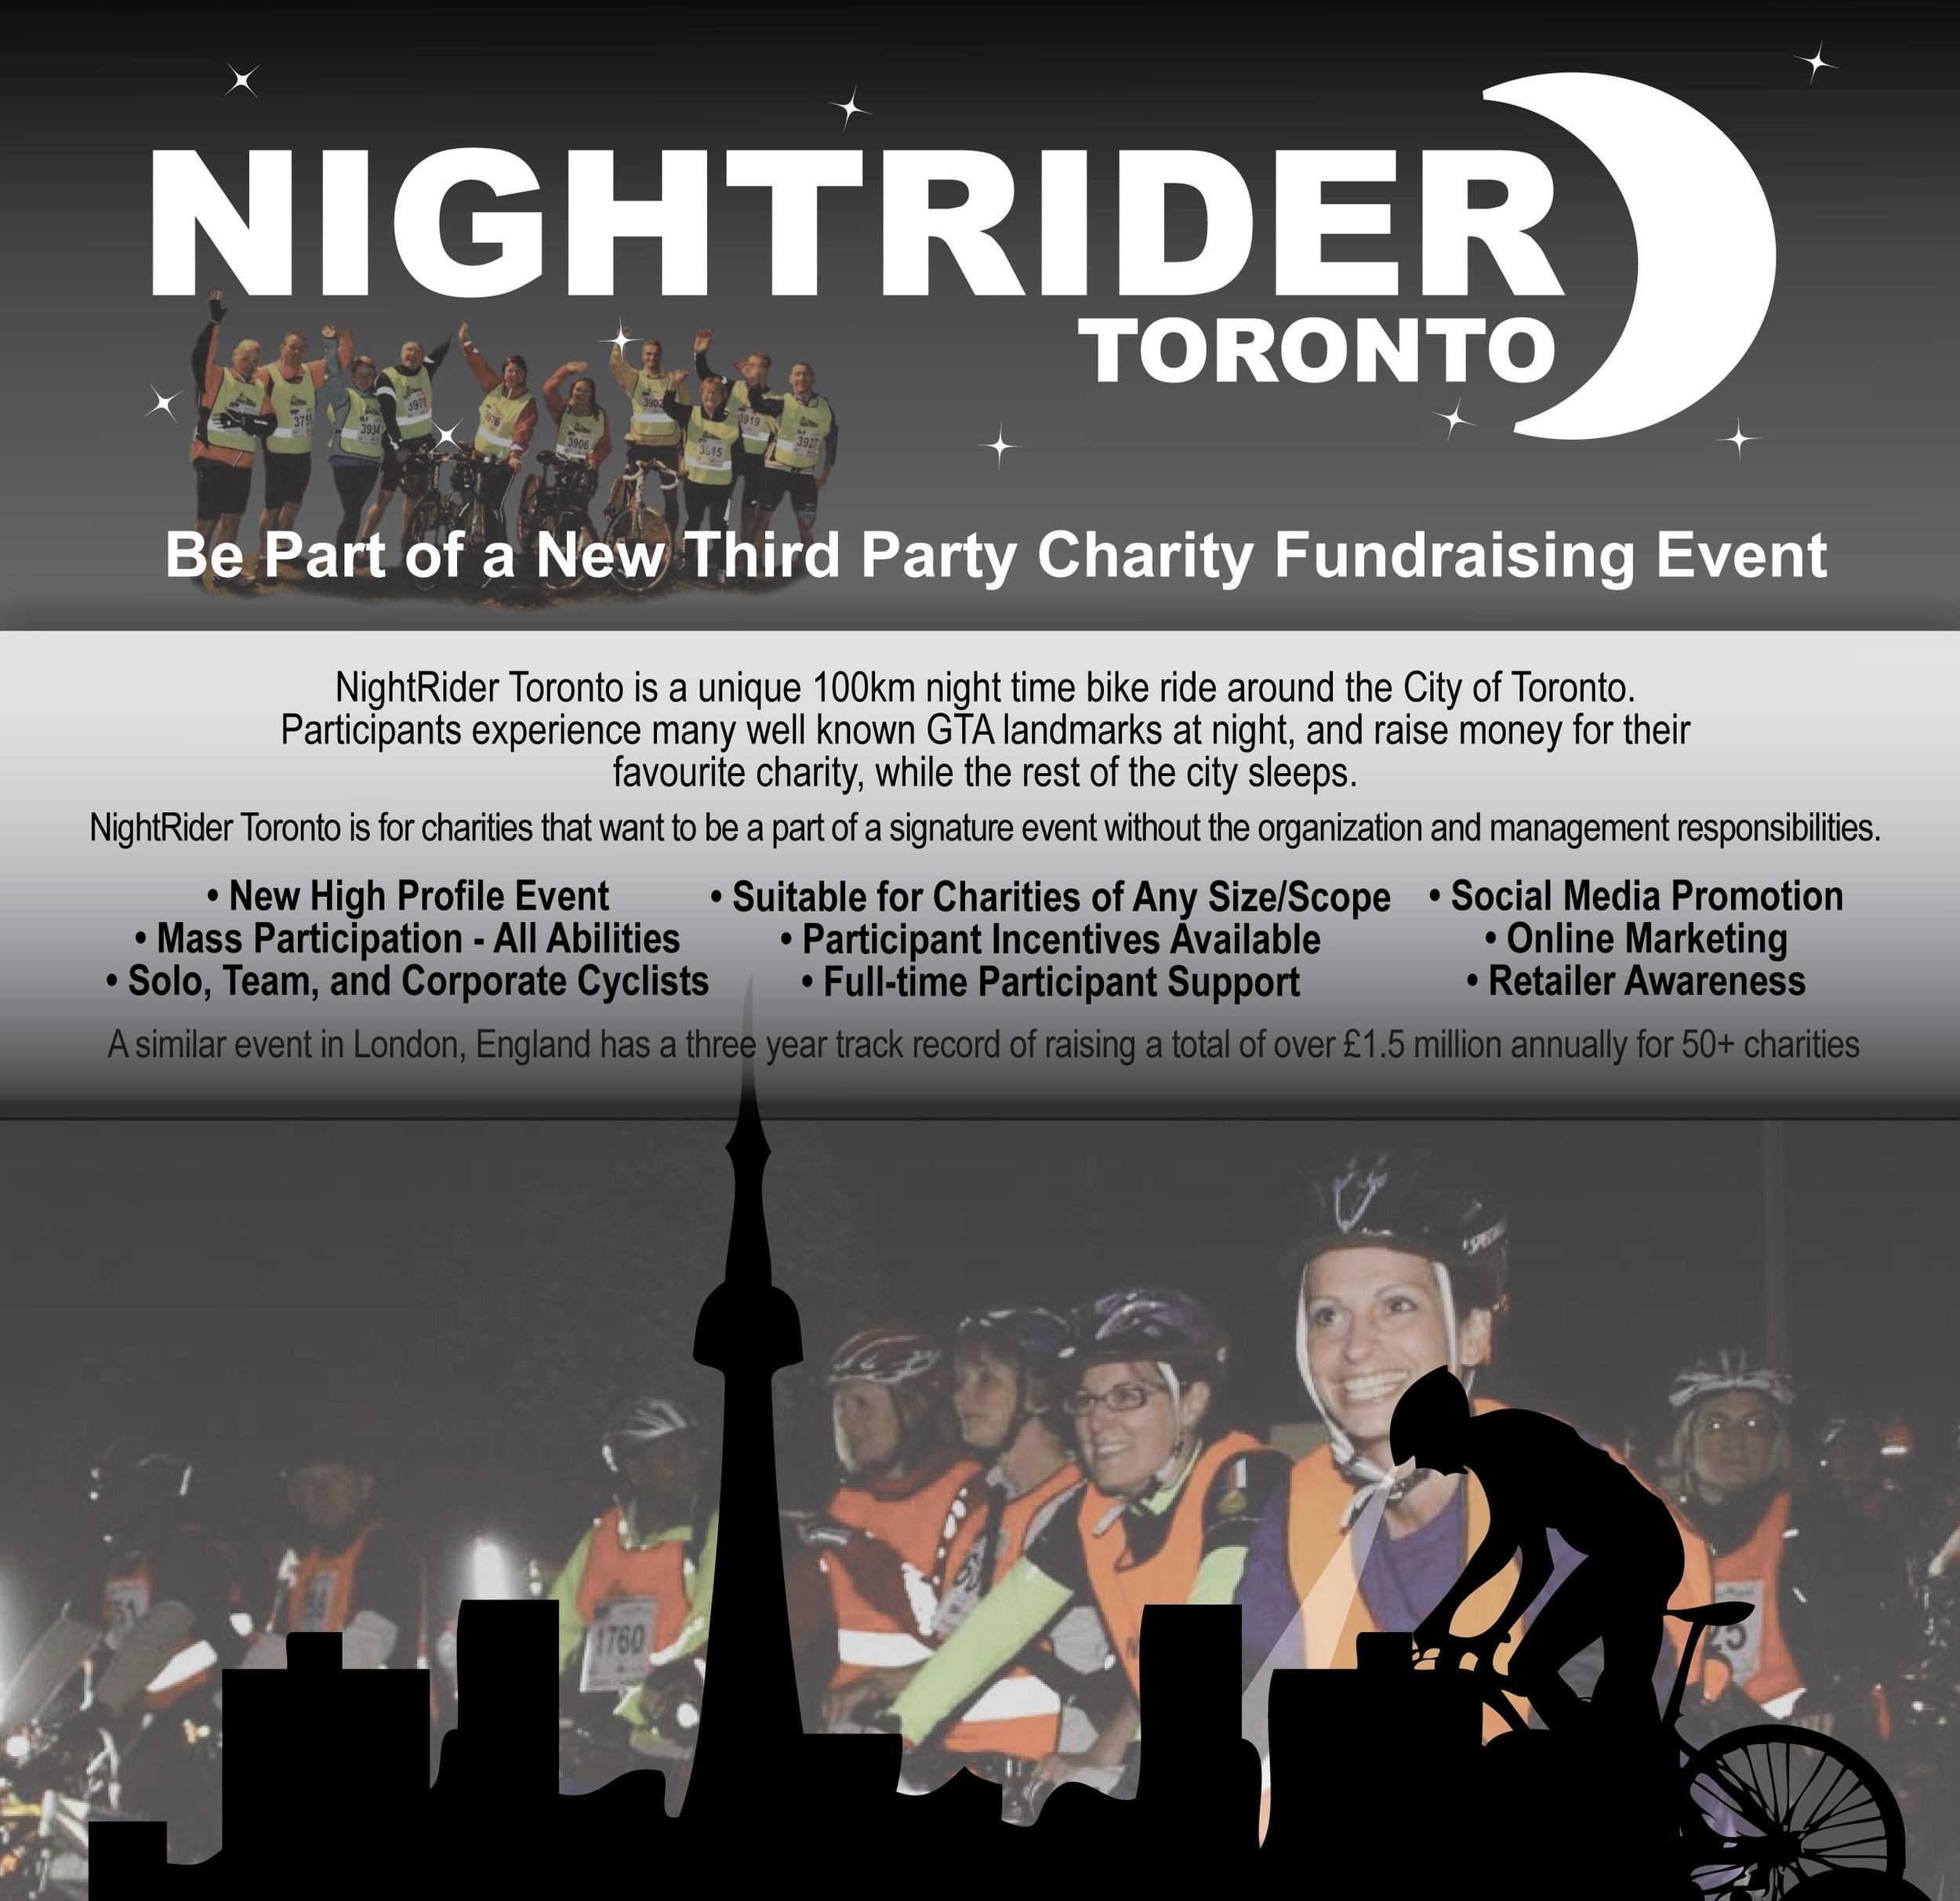 NightRiderPoster5-cropped.jpg